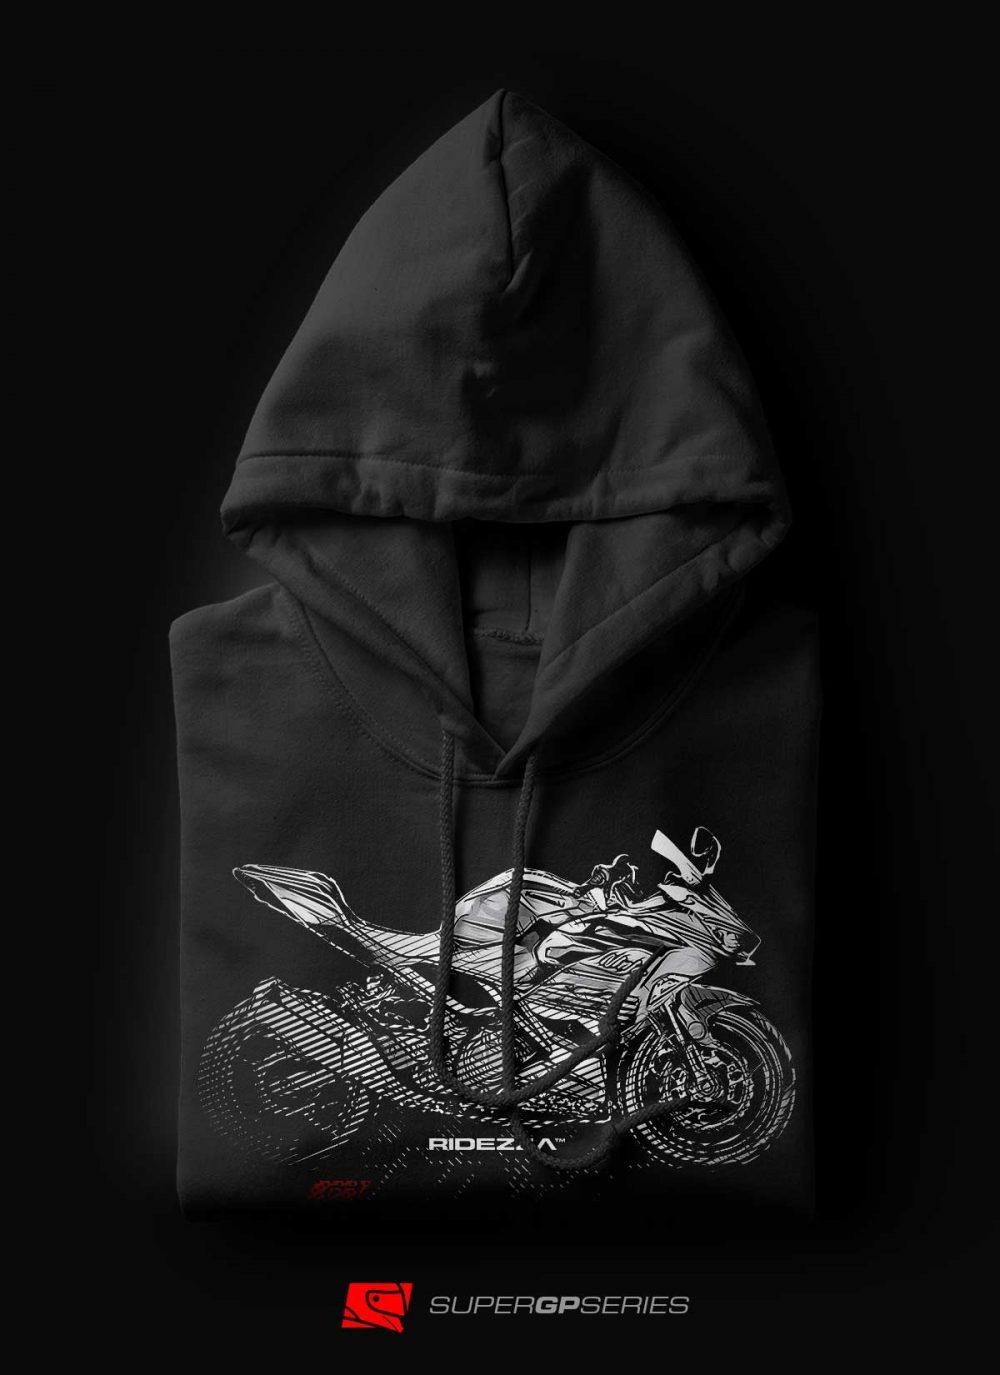 Ridezza Ninja 400 SuperGP Series Hoodie